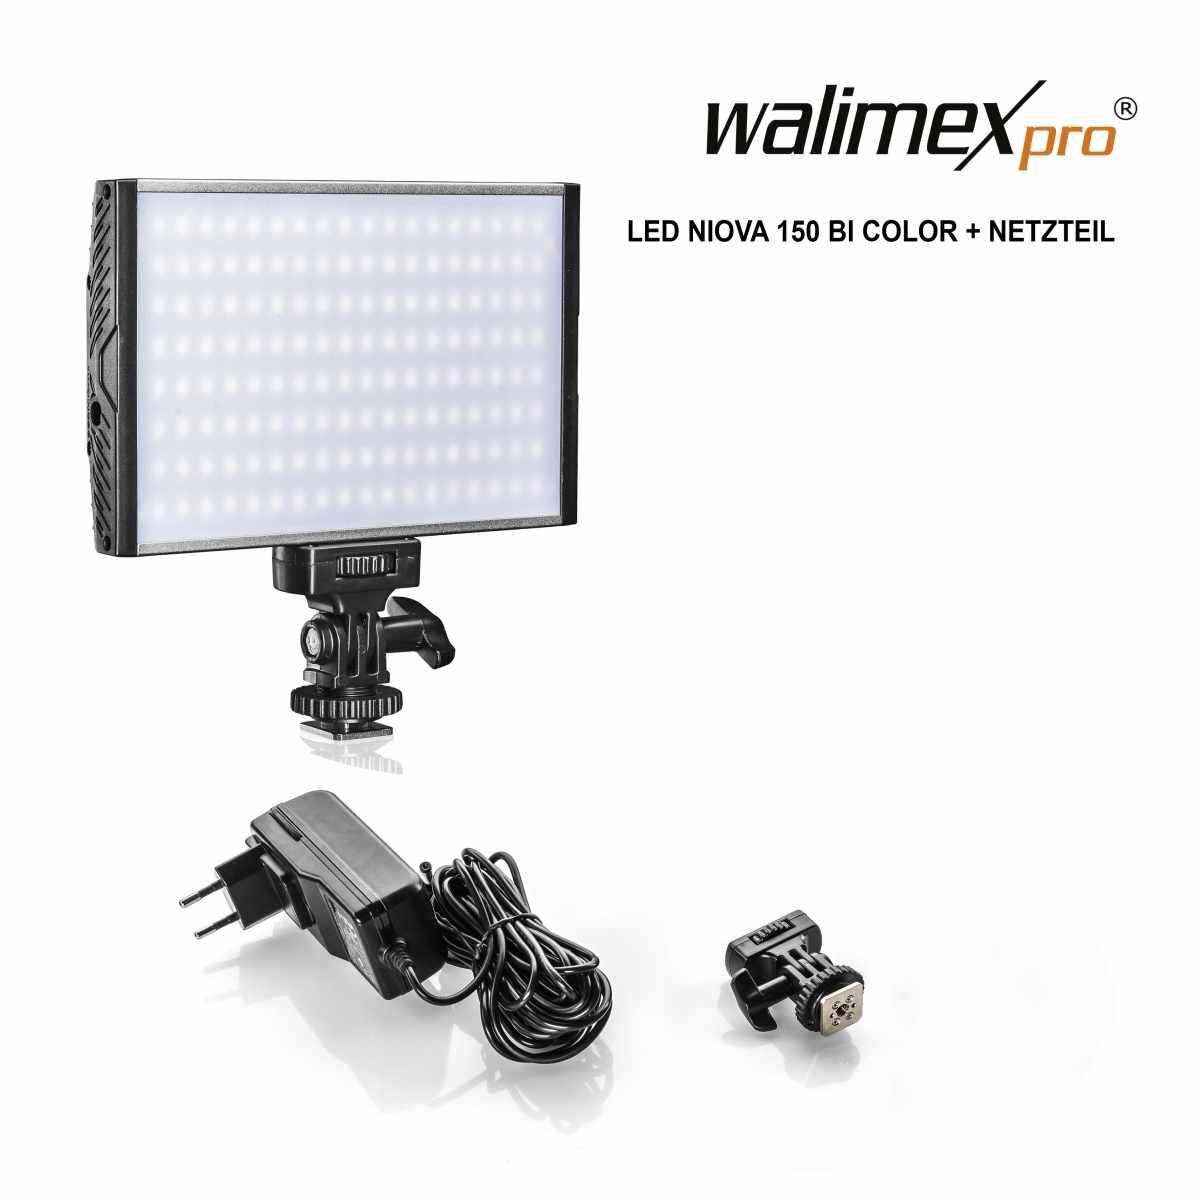 Walimex pro LED Niova 150 Bi Color + power adapter